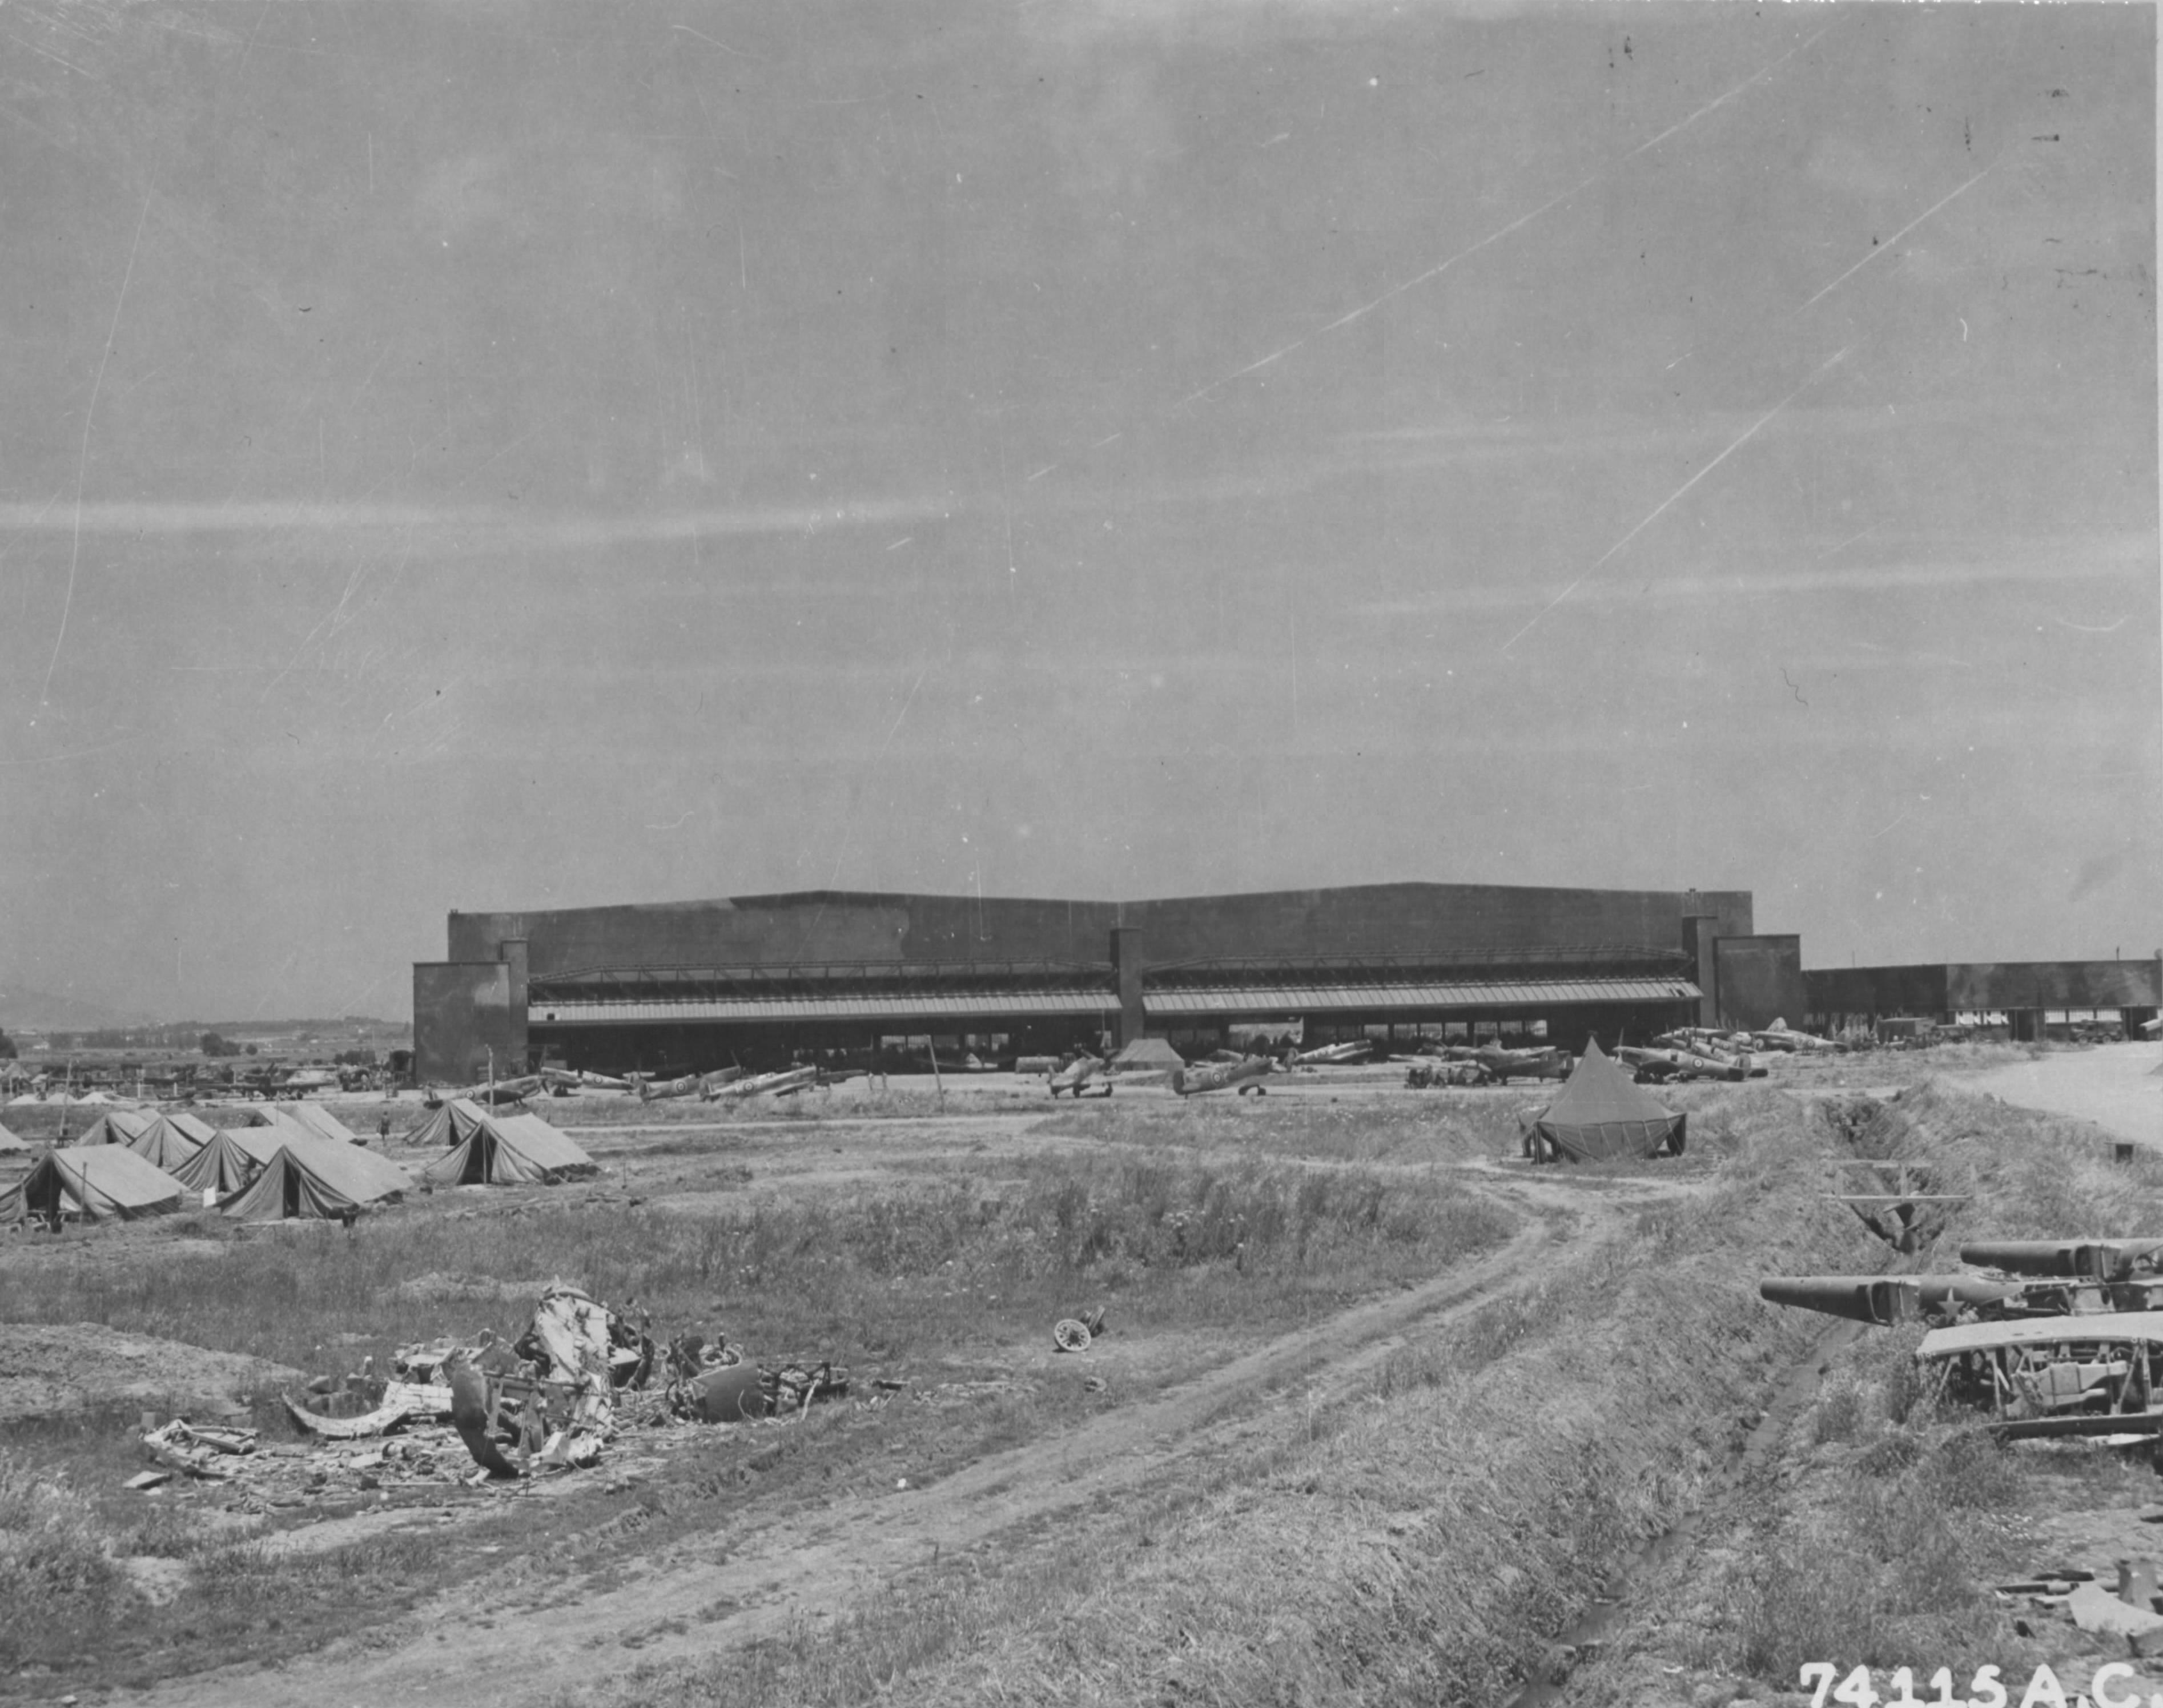 Airbase hangars at Maison Blanche Airfield Algiers Algeria June 1943 02